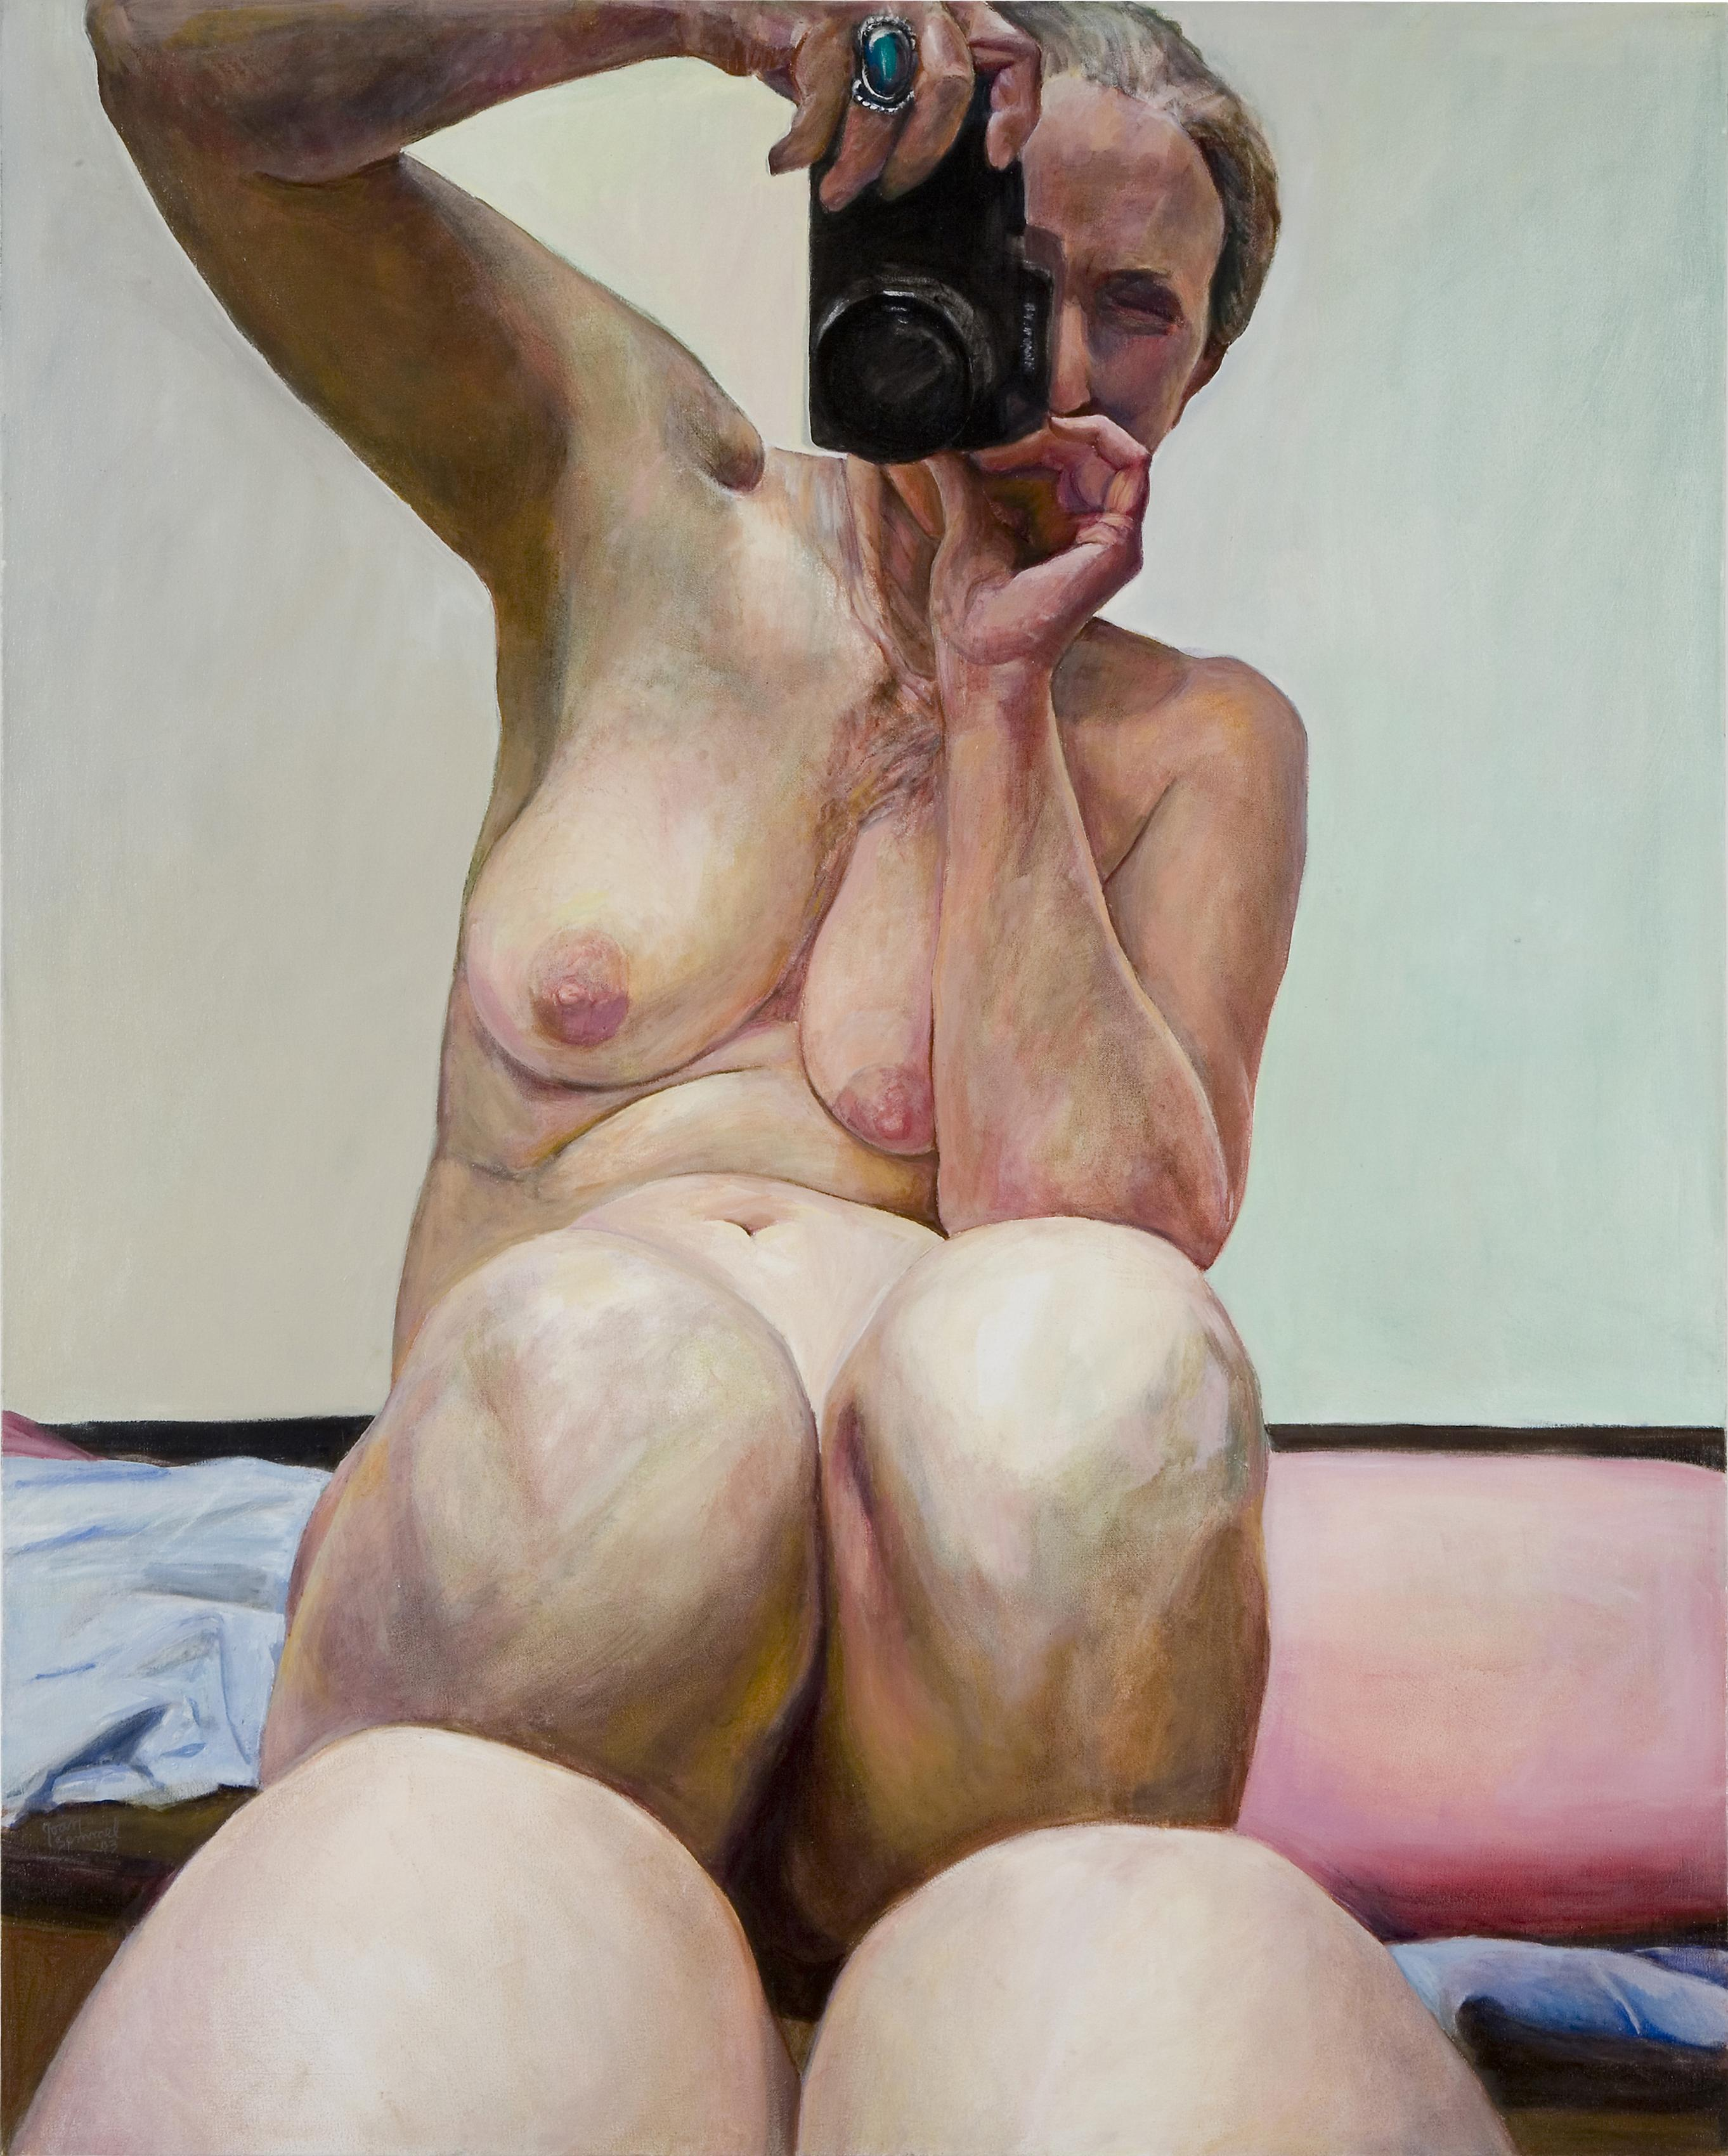 knees together joan semmel nude portrait photograph artist painting painter